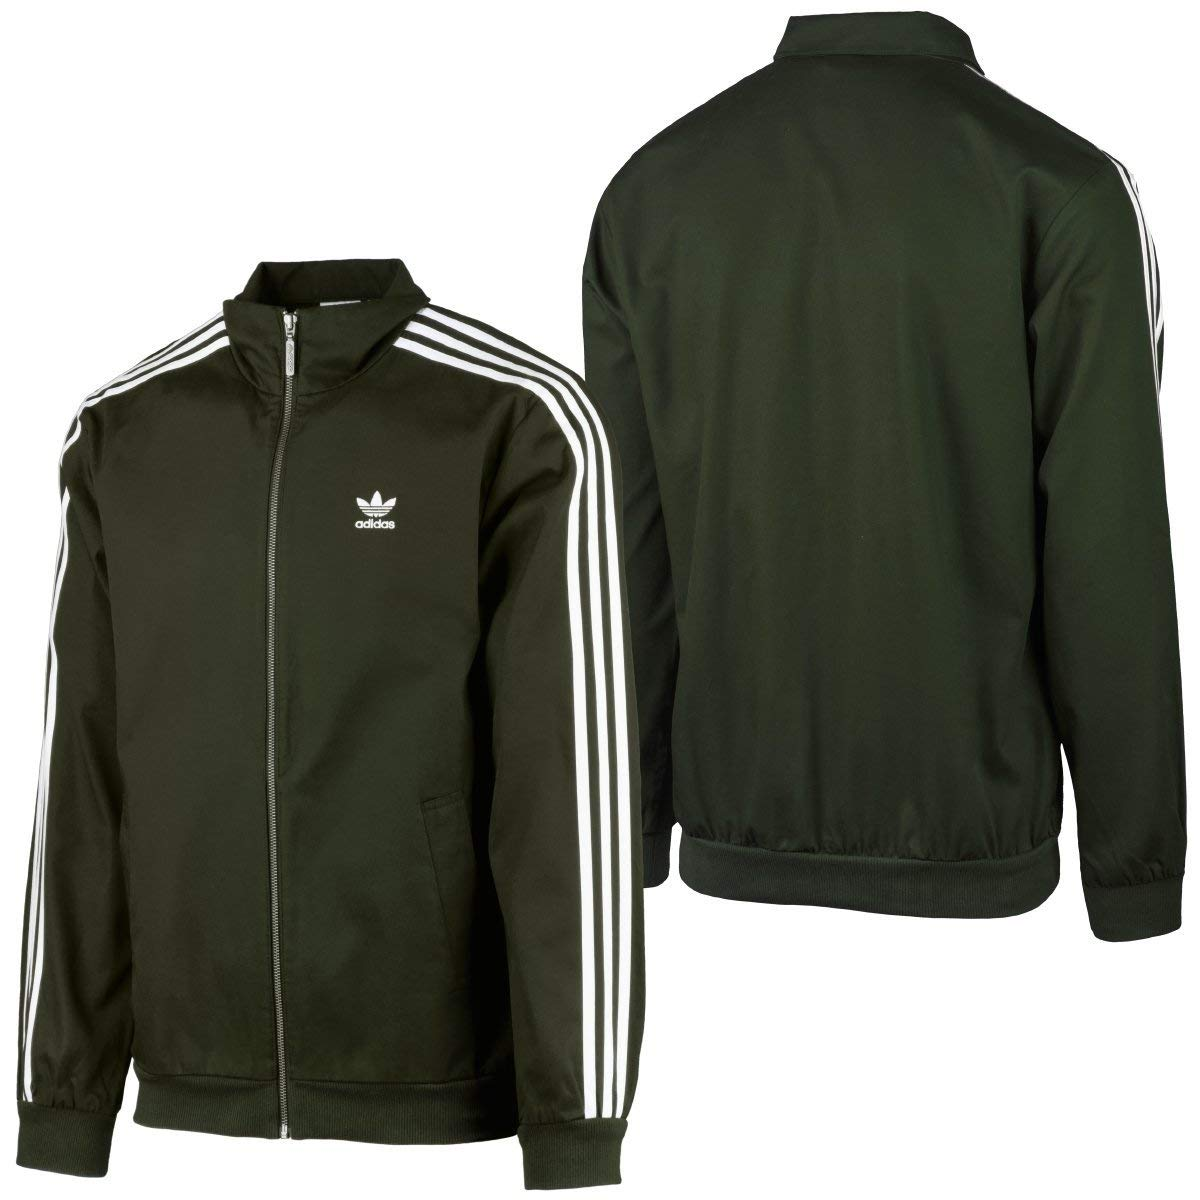 35bd587a04cb adidas Men s Woven Track Jacket  Amazon.co.uk  Sports   Outdoors